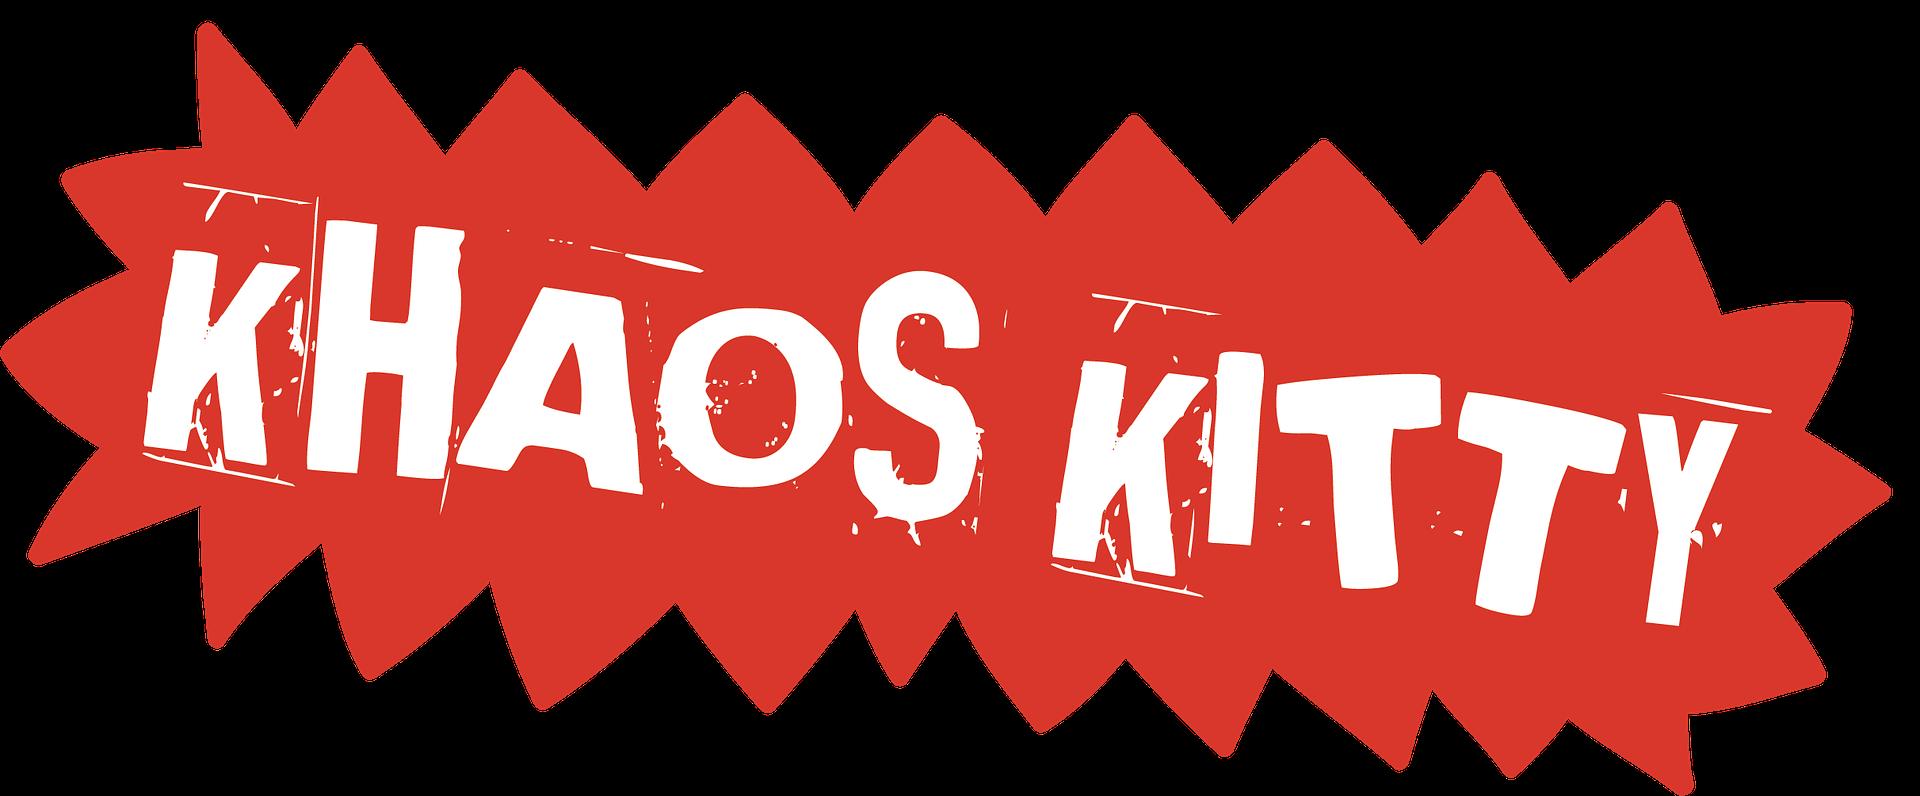 Khaos Kitty